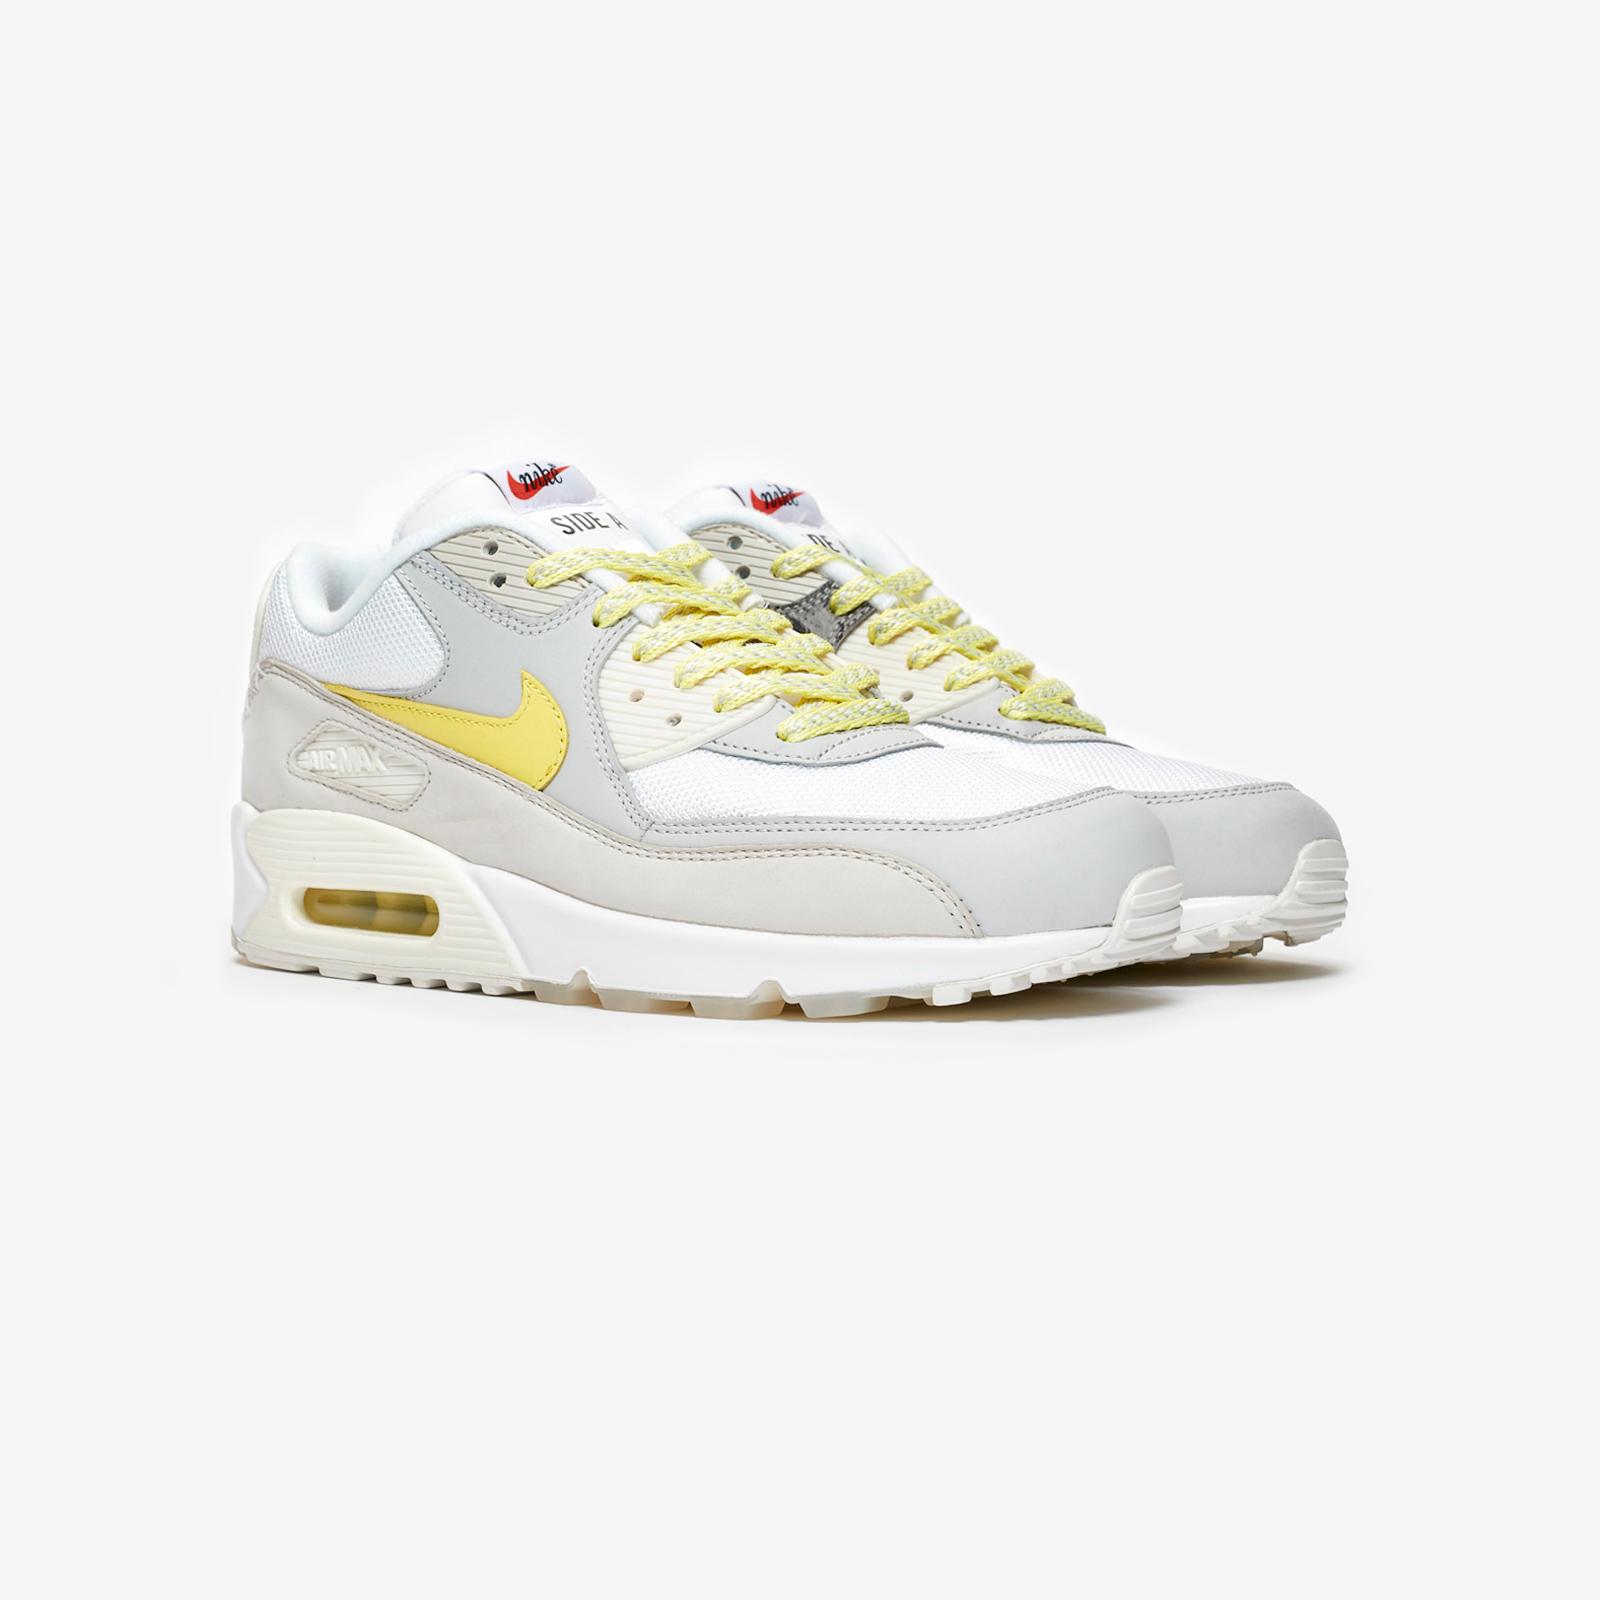 "92948ecc92 Nike Air Max 90 Premium ""Side A"" - Ci6394-100 - Sneakersnstuff | sneakers &  streetwear online since 1999"